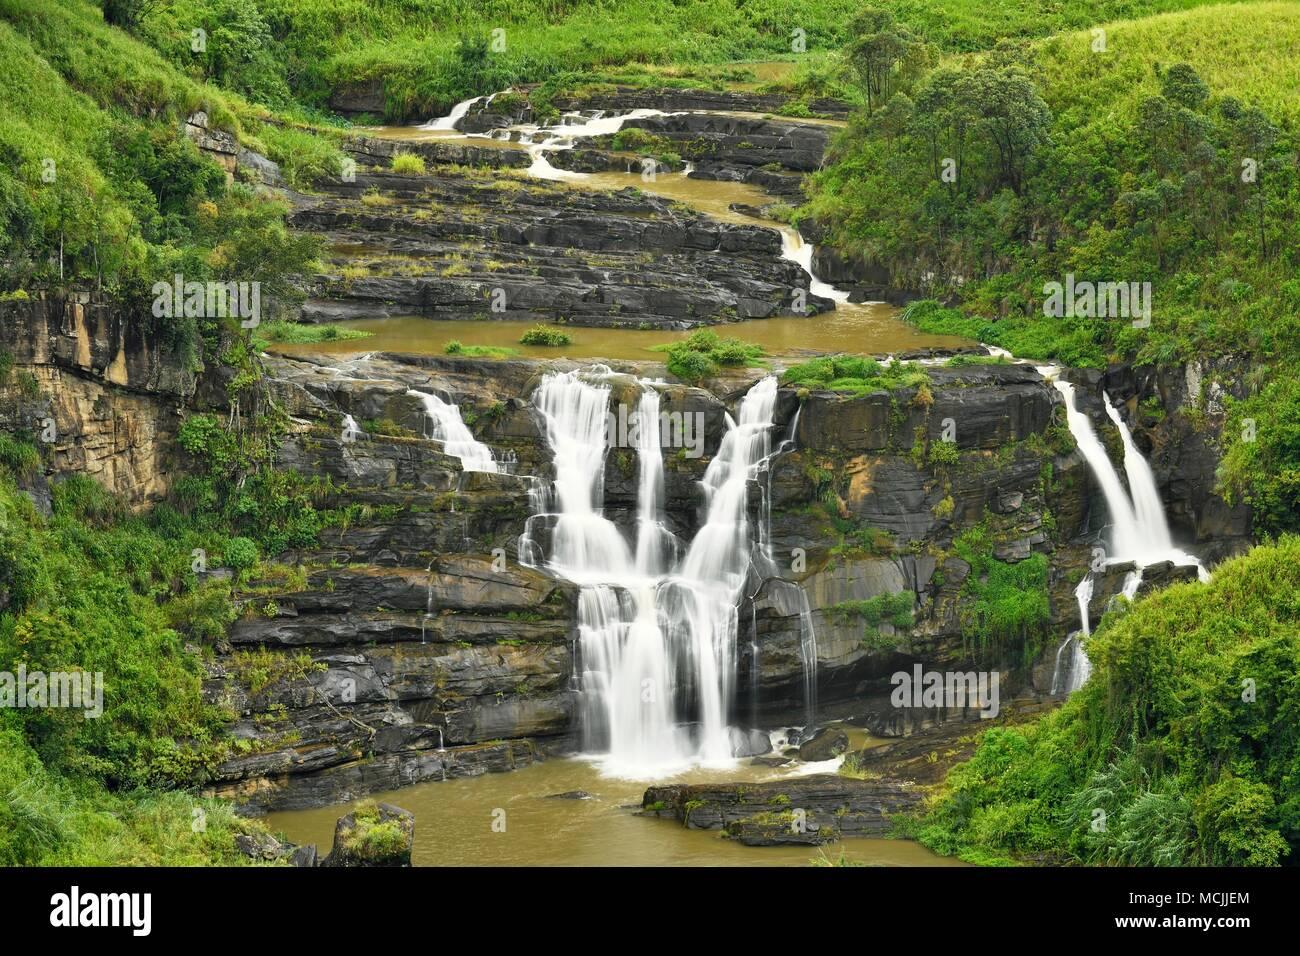 Sainte-claire's Falls, hauts plateaux du centre, Talawakale, Sri Lanka Photo Stock